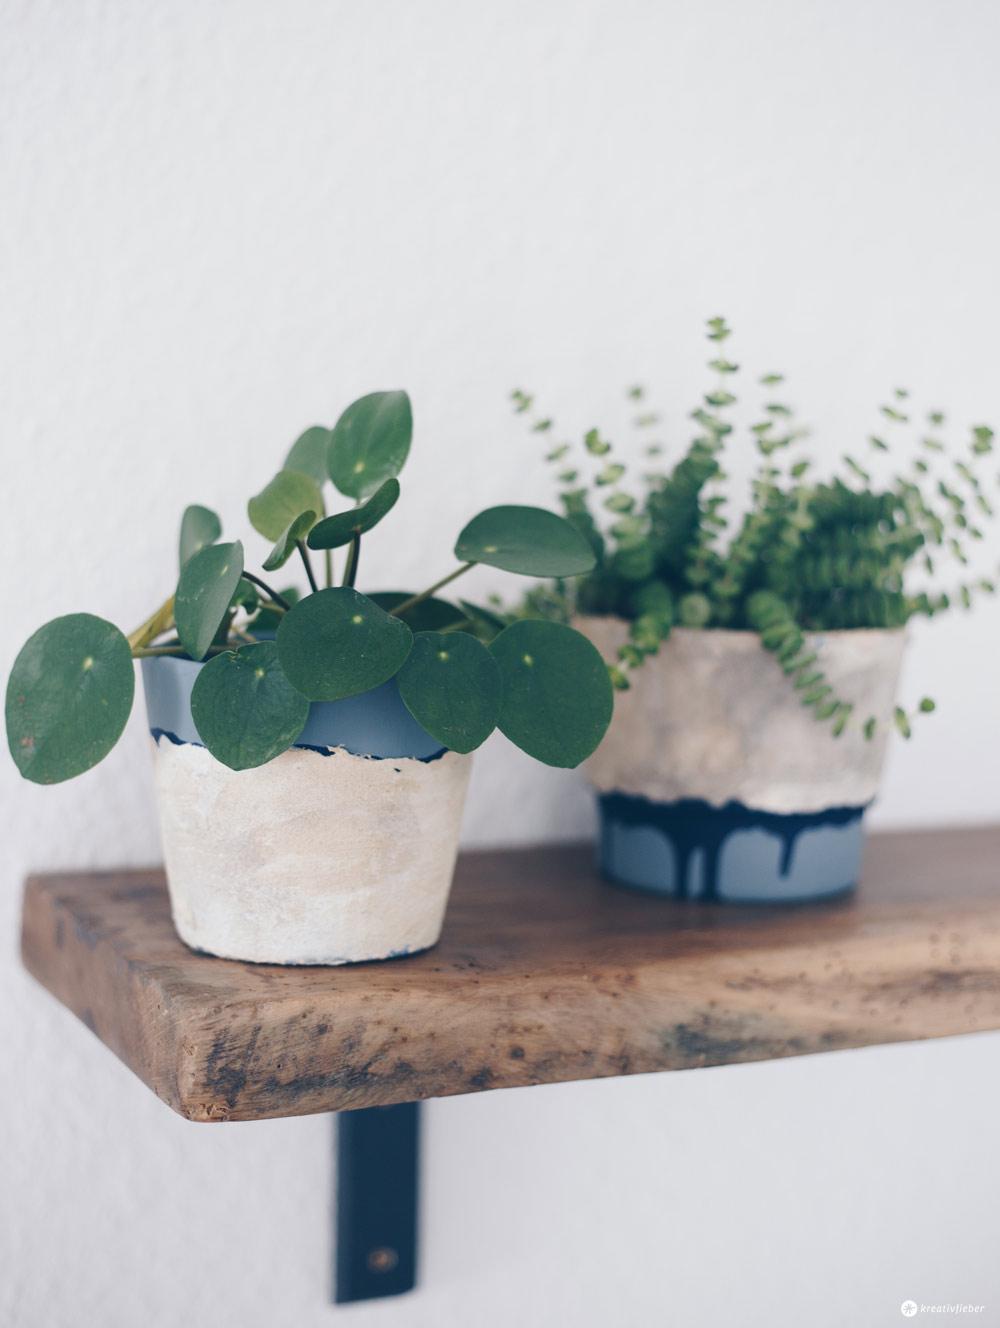 DIY Blumentöpfe mit Steinoptik selbermachen - Upcycling Ideen - DIY Tutorial - DIY Deko